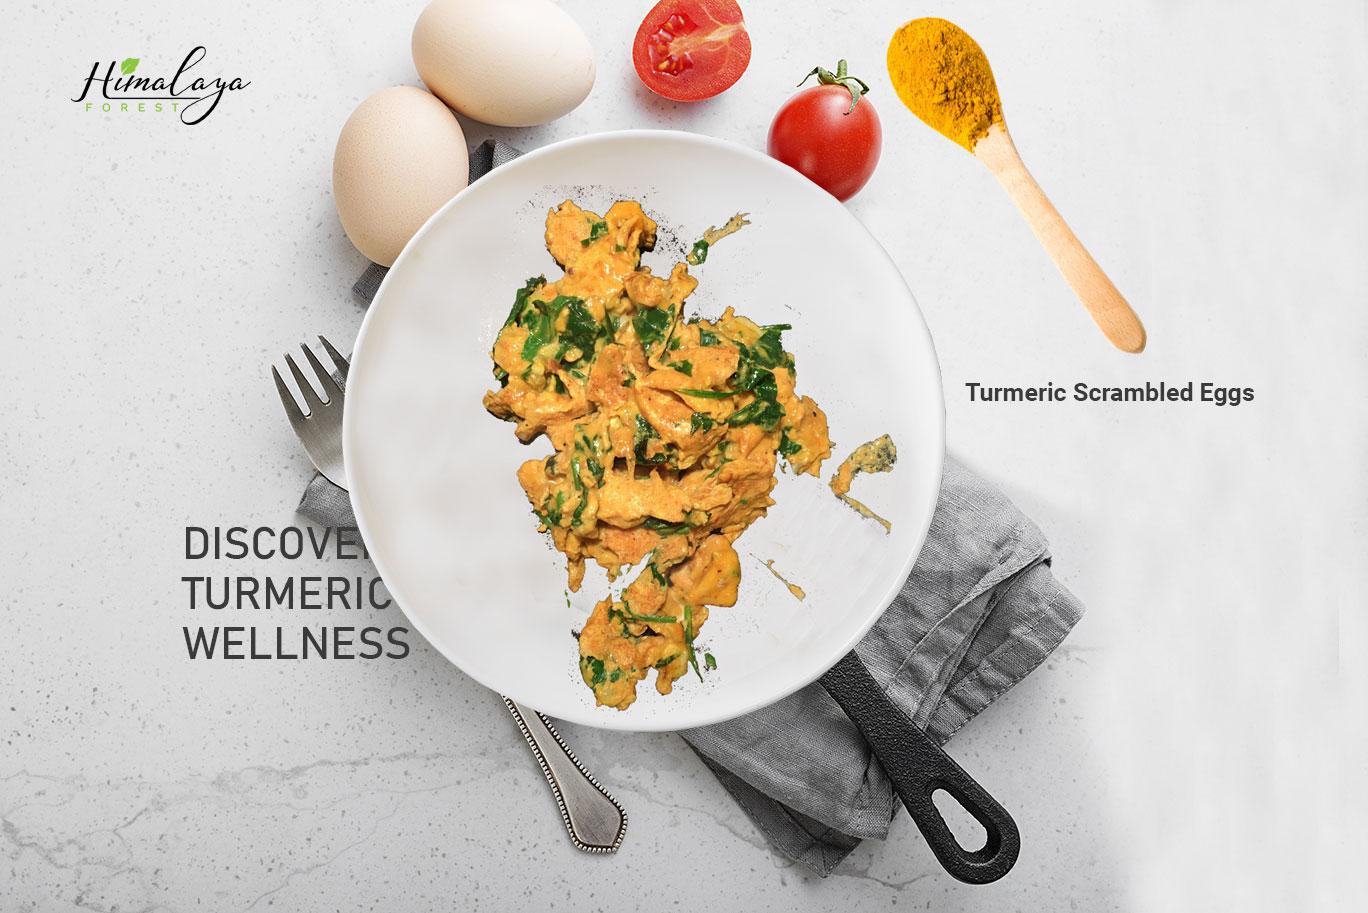 Super Healthy and Tasty Turmeric Scrambled Eggs